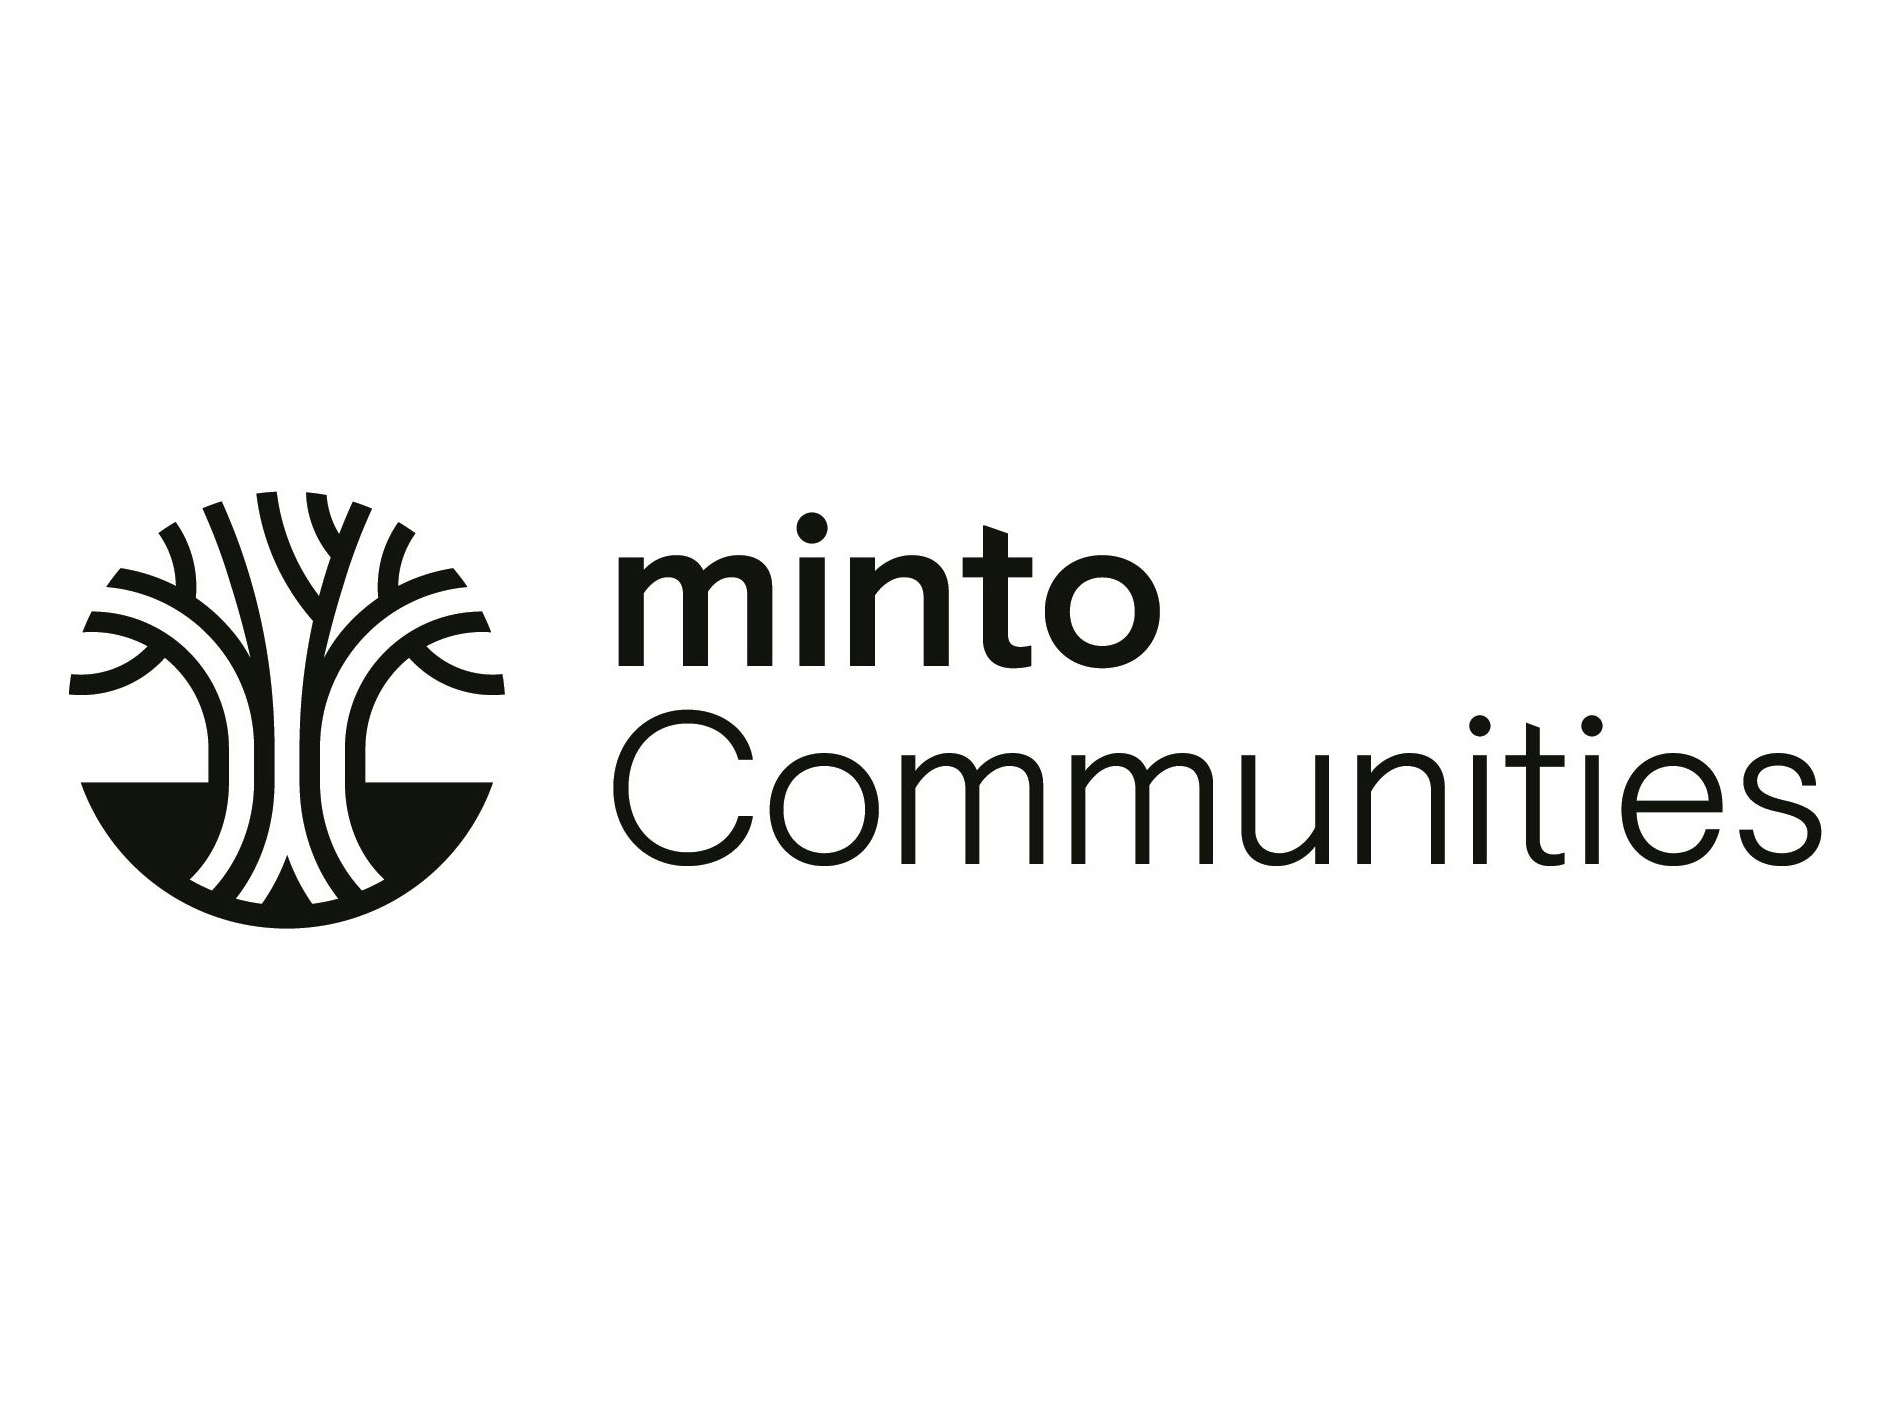 Minto Communities (Internet).jpg